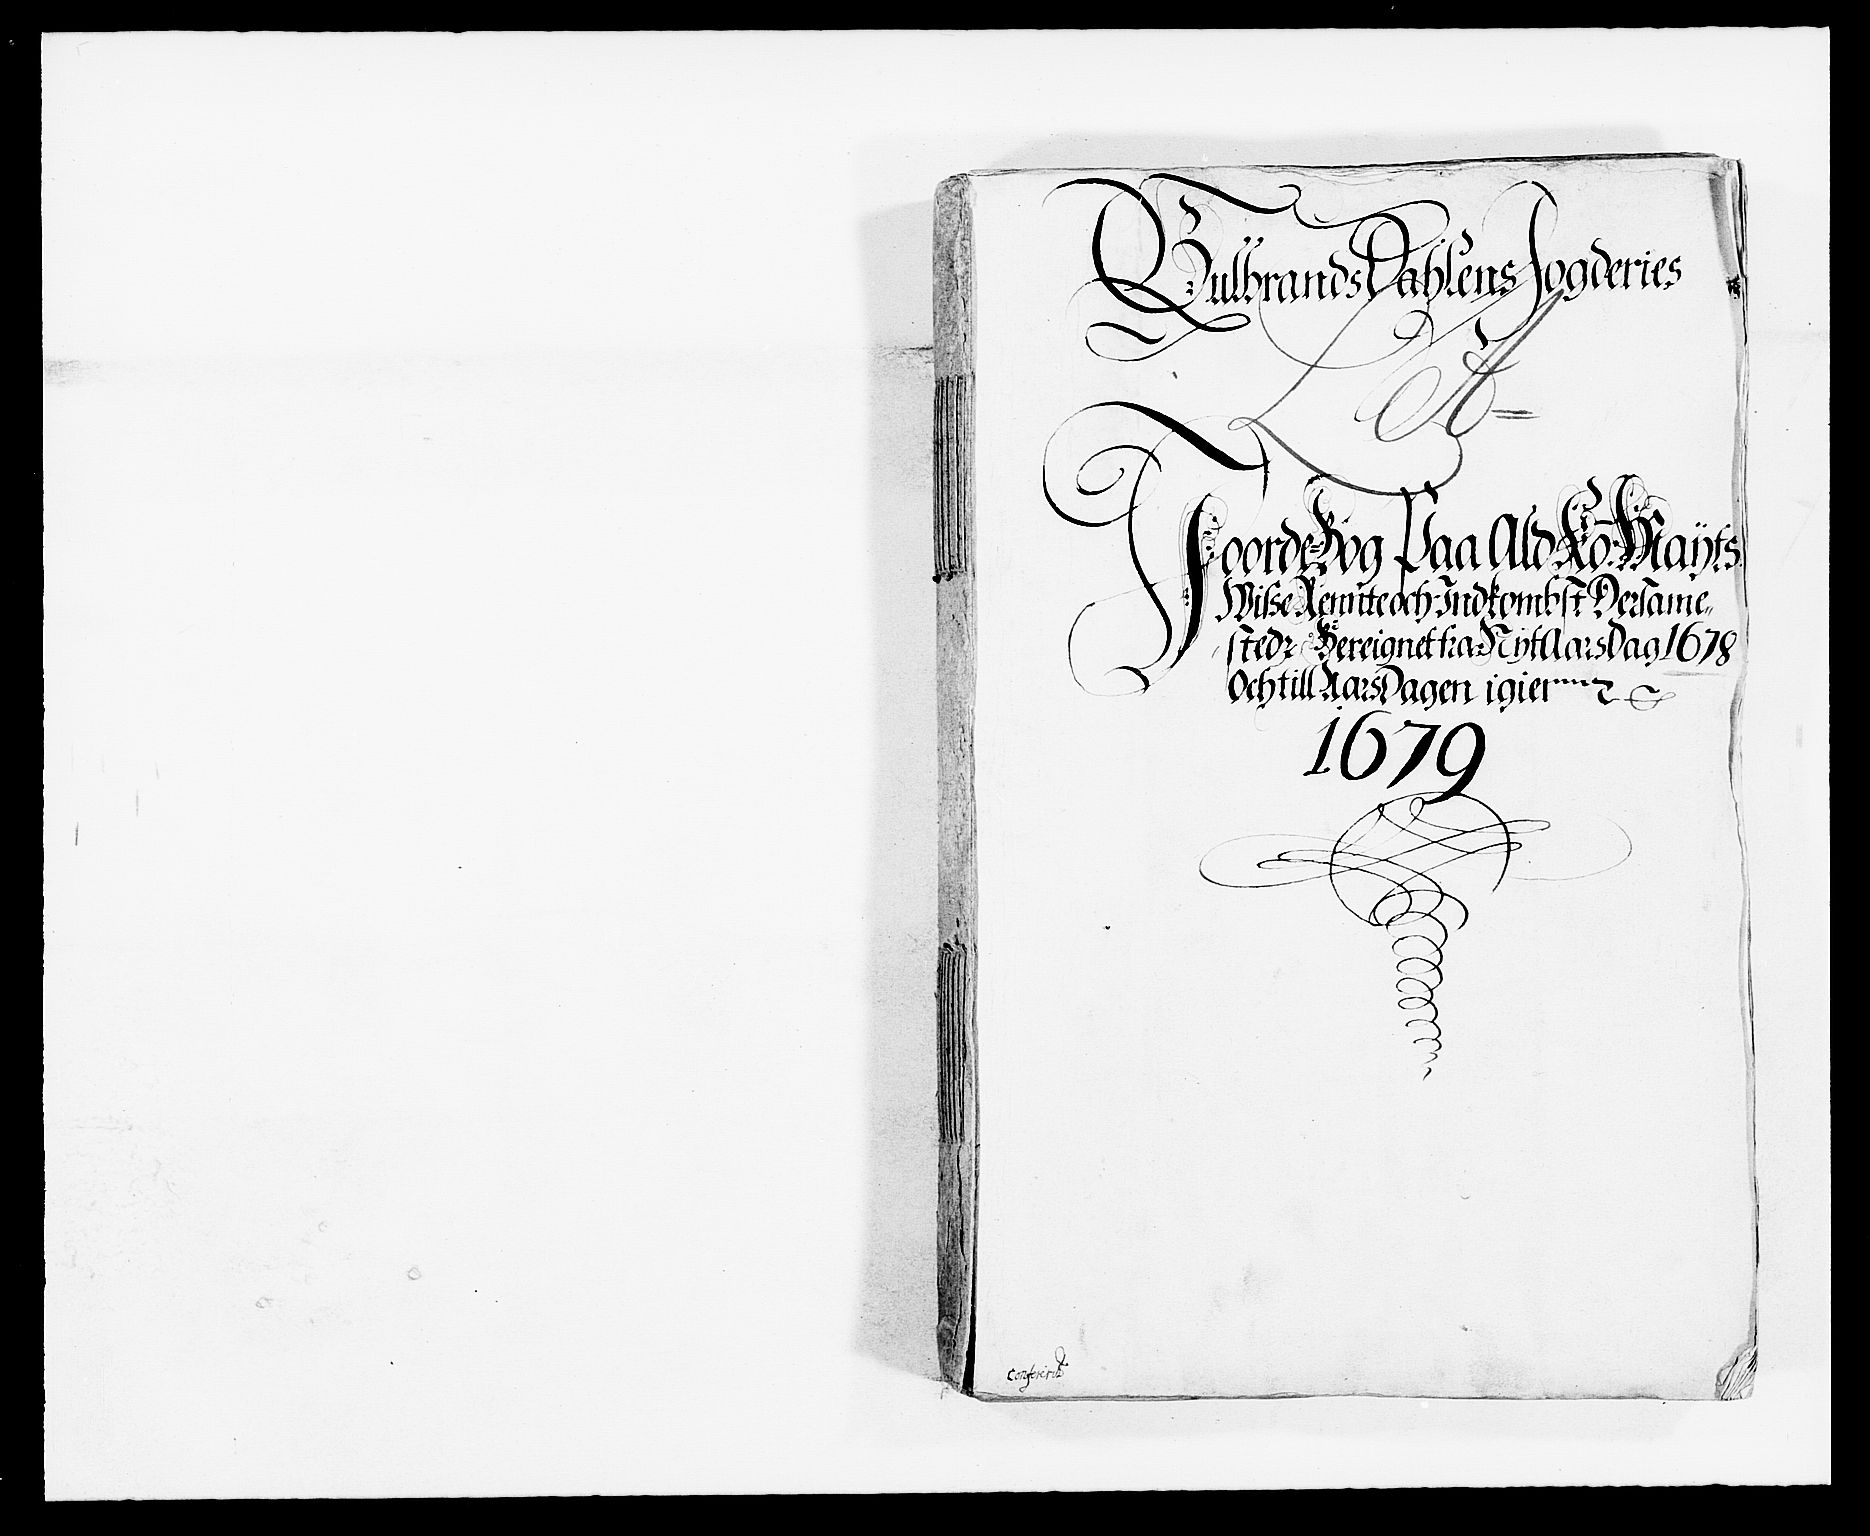 RA, Rentekammeret inntil 1814, Reviderte regnskaper, Fogderegnskap, R17/L1152: Fogderegnskap Gudbrandsdal, 1678-1679, s. 27